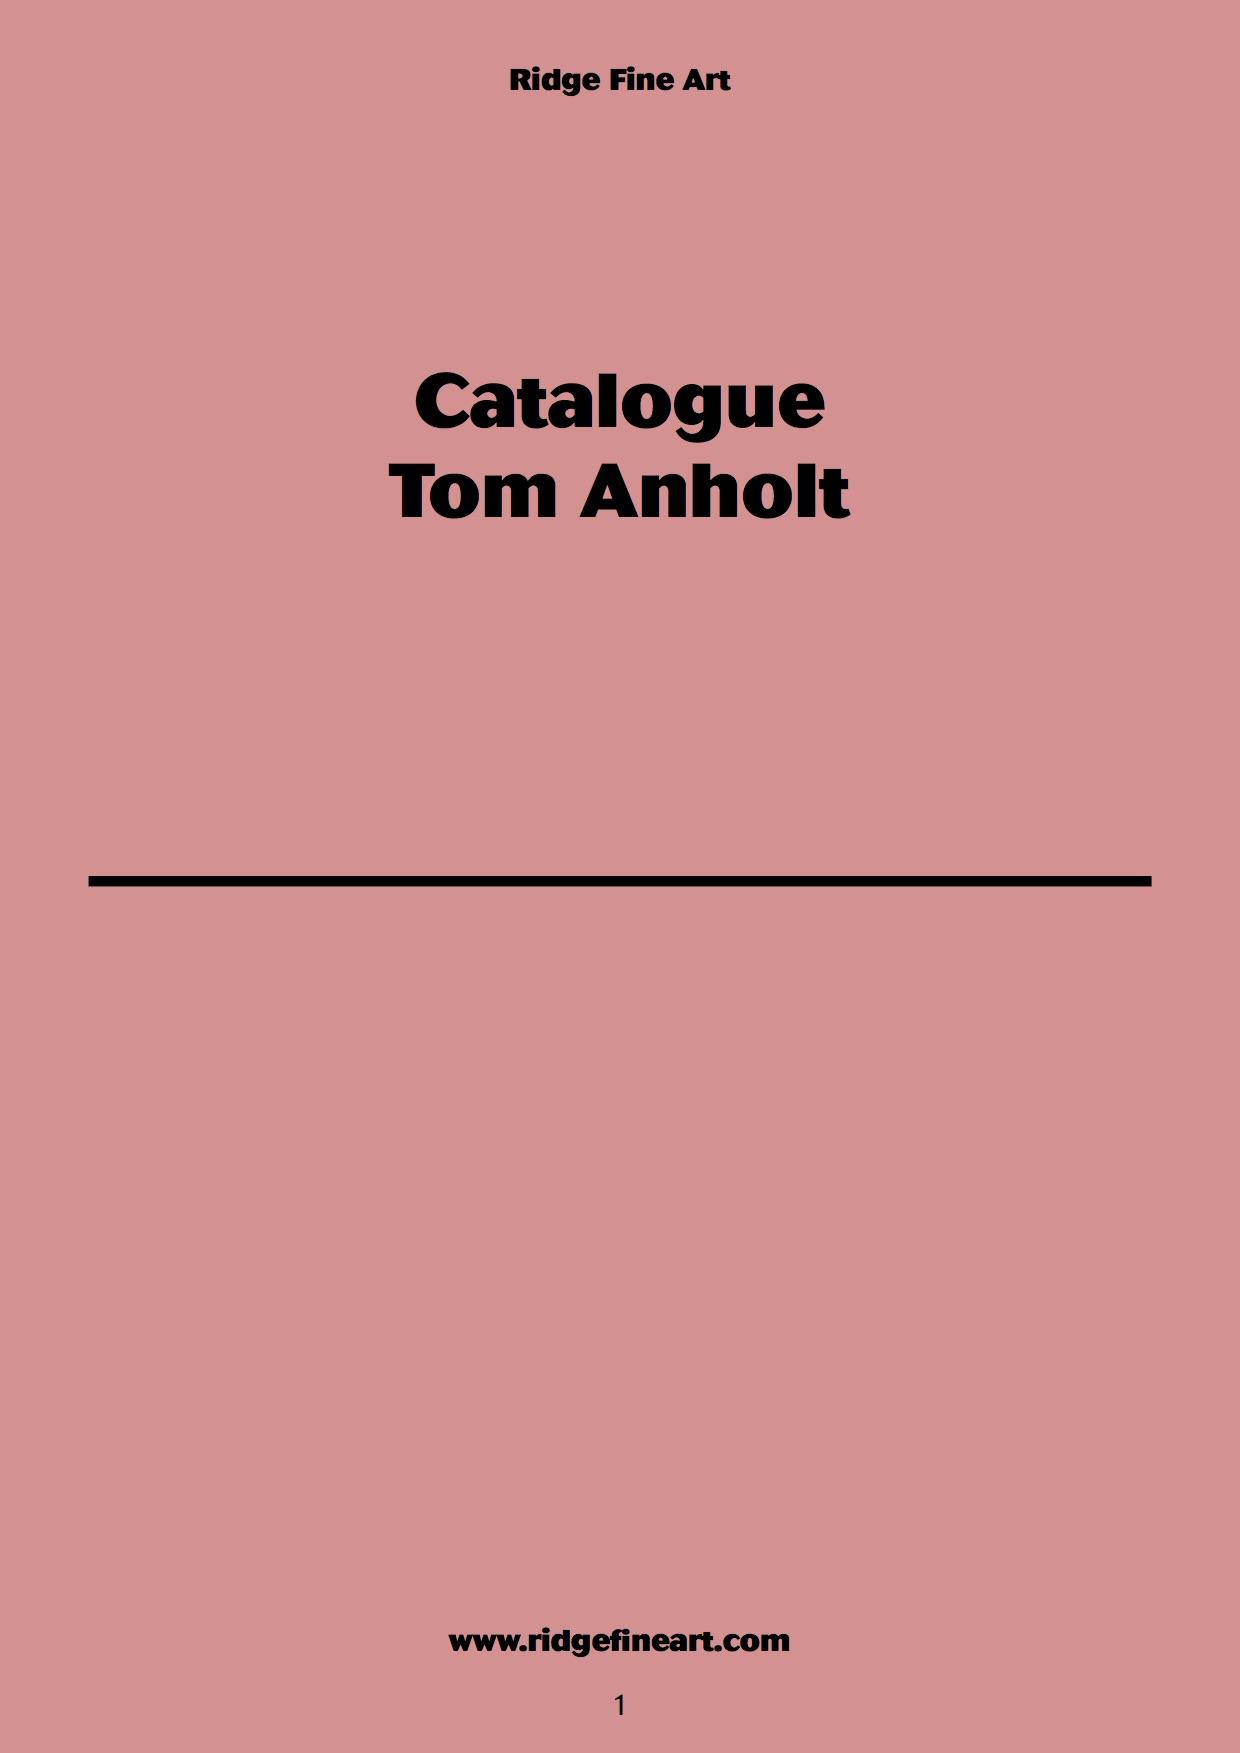 Catalogue Tom Anholt   Ridge Fine Art